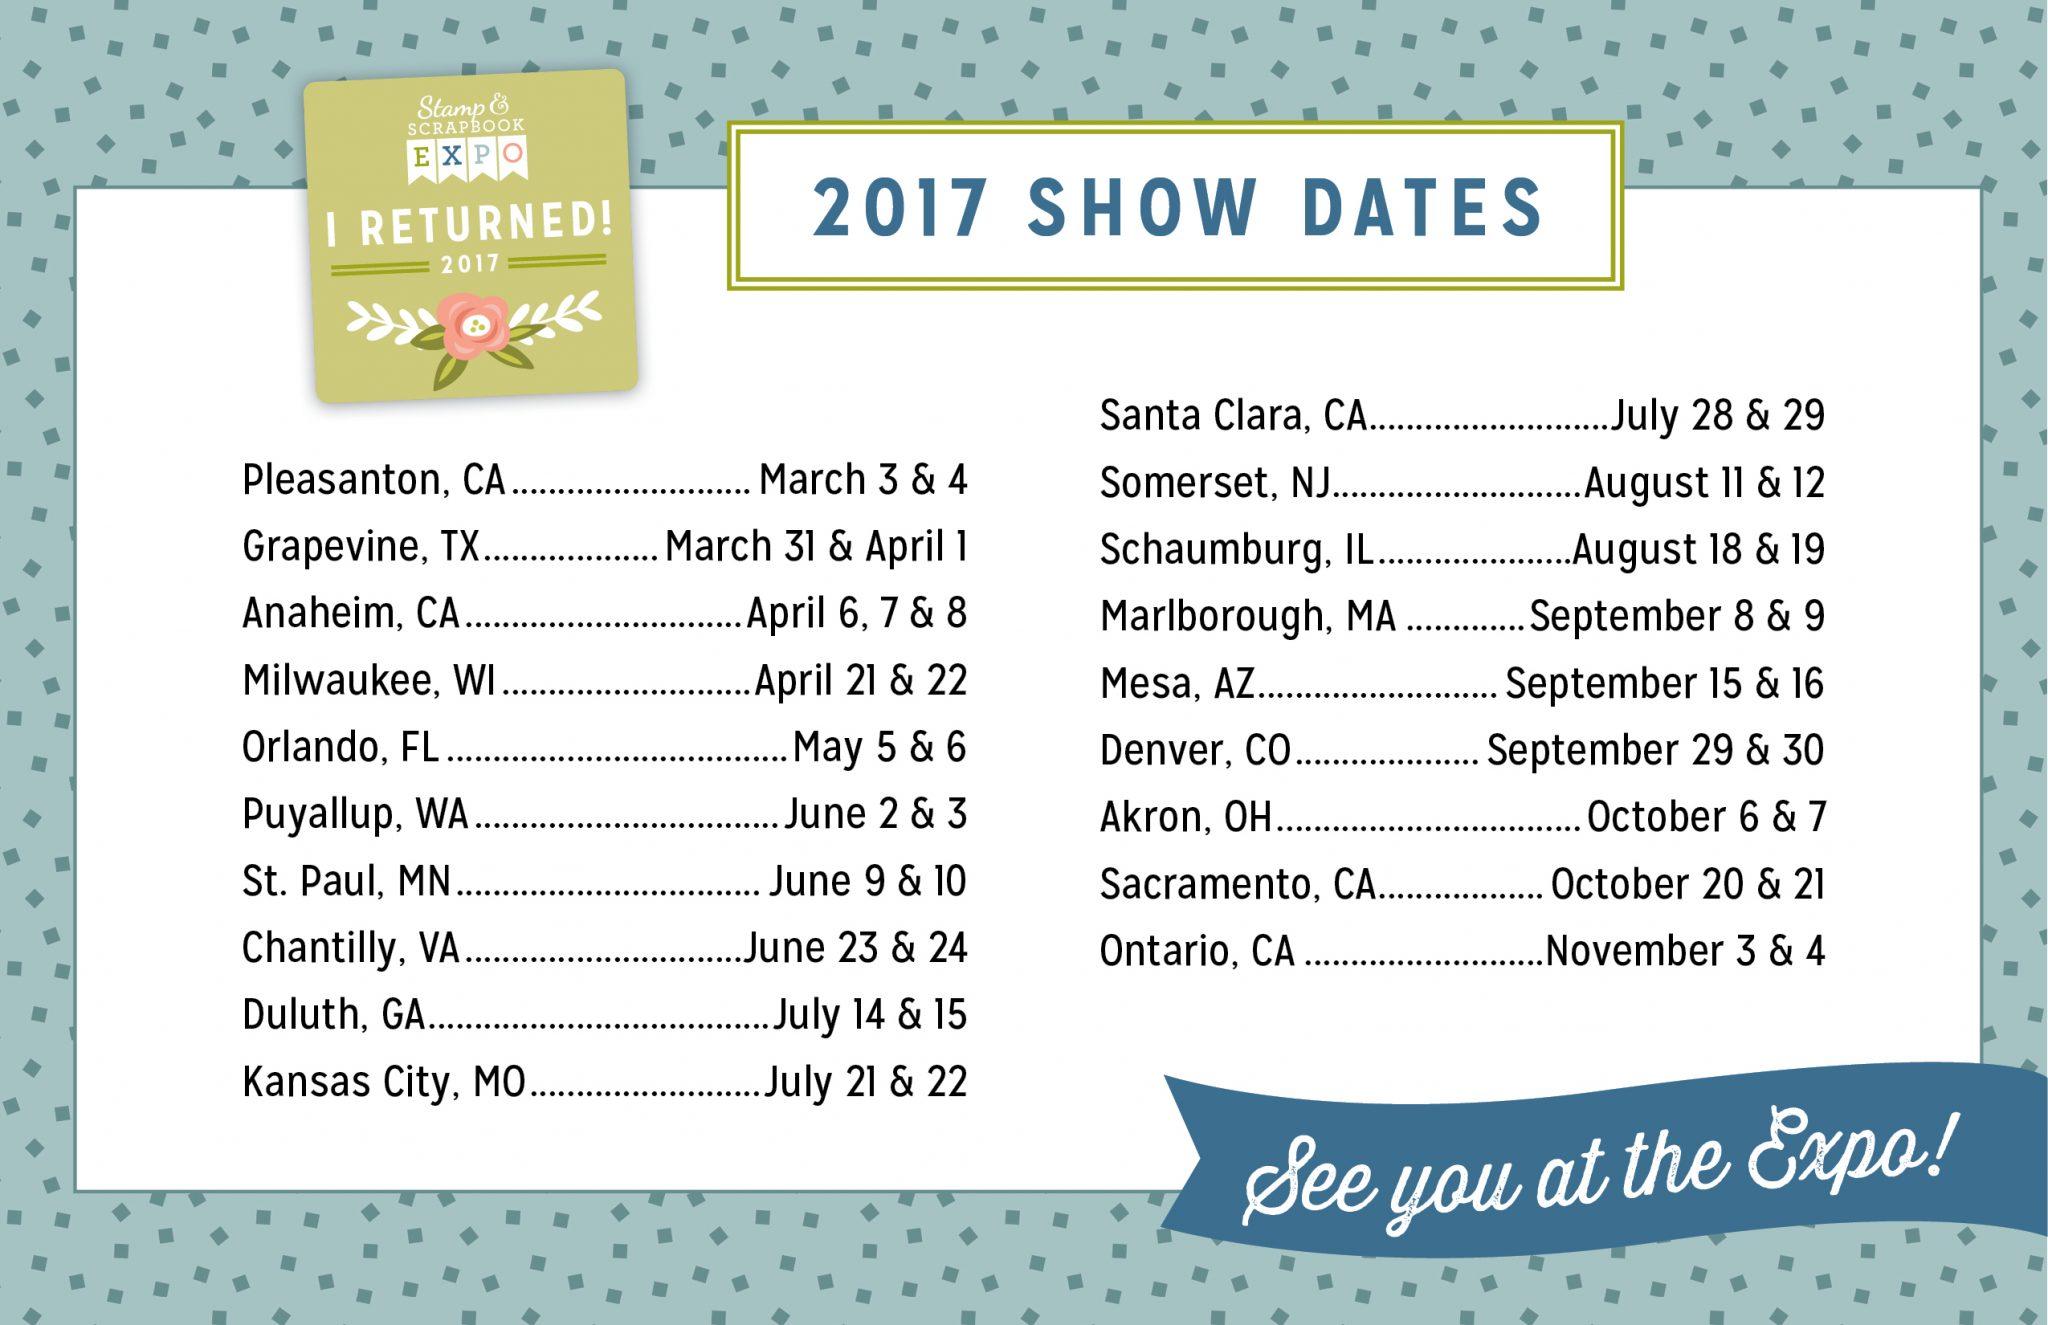 2017 Show Dates